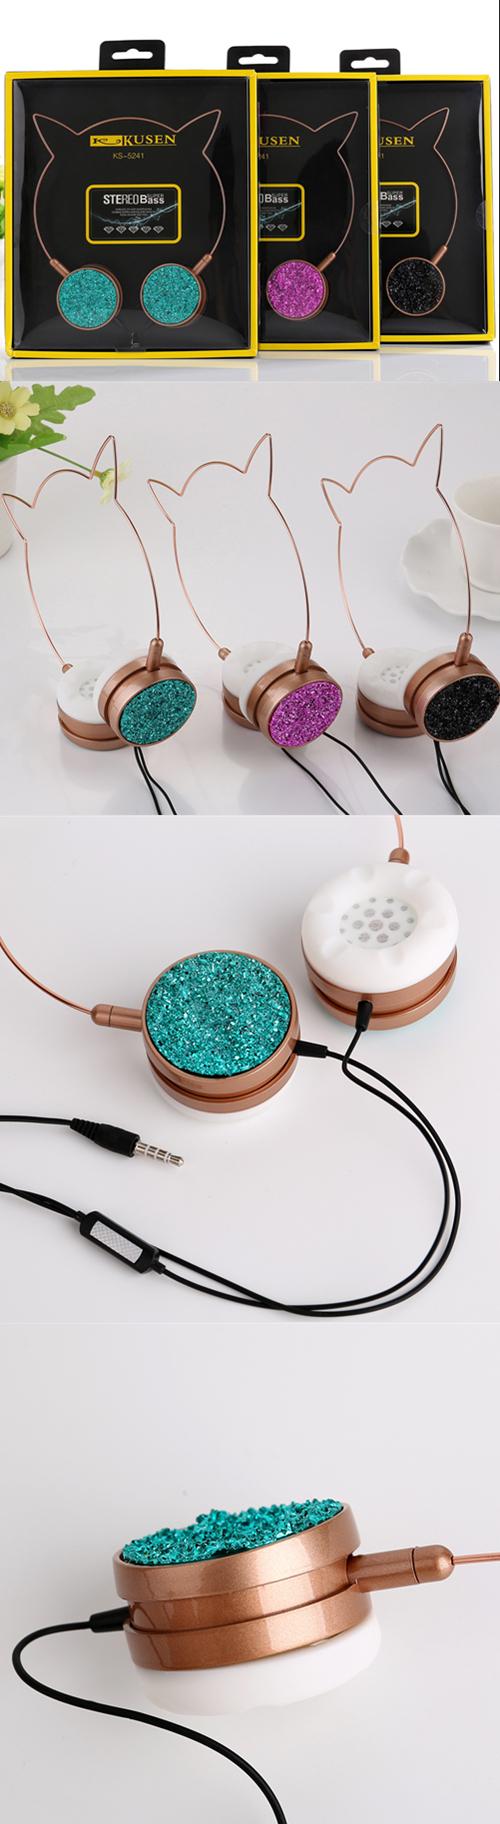 cat-headphone-main-spec.jpg